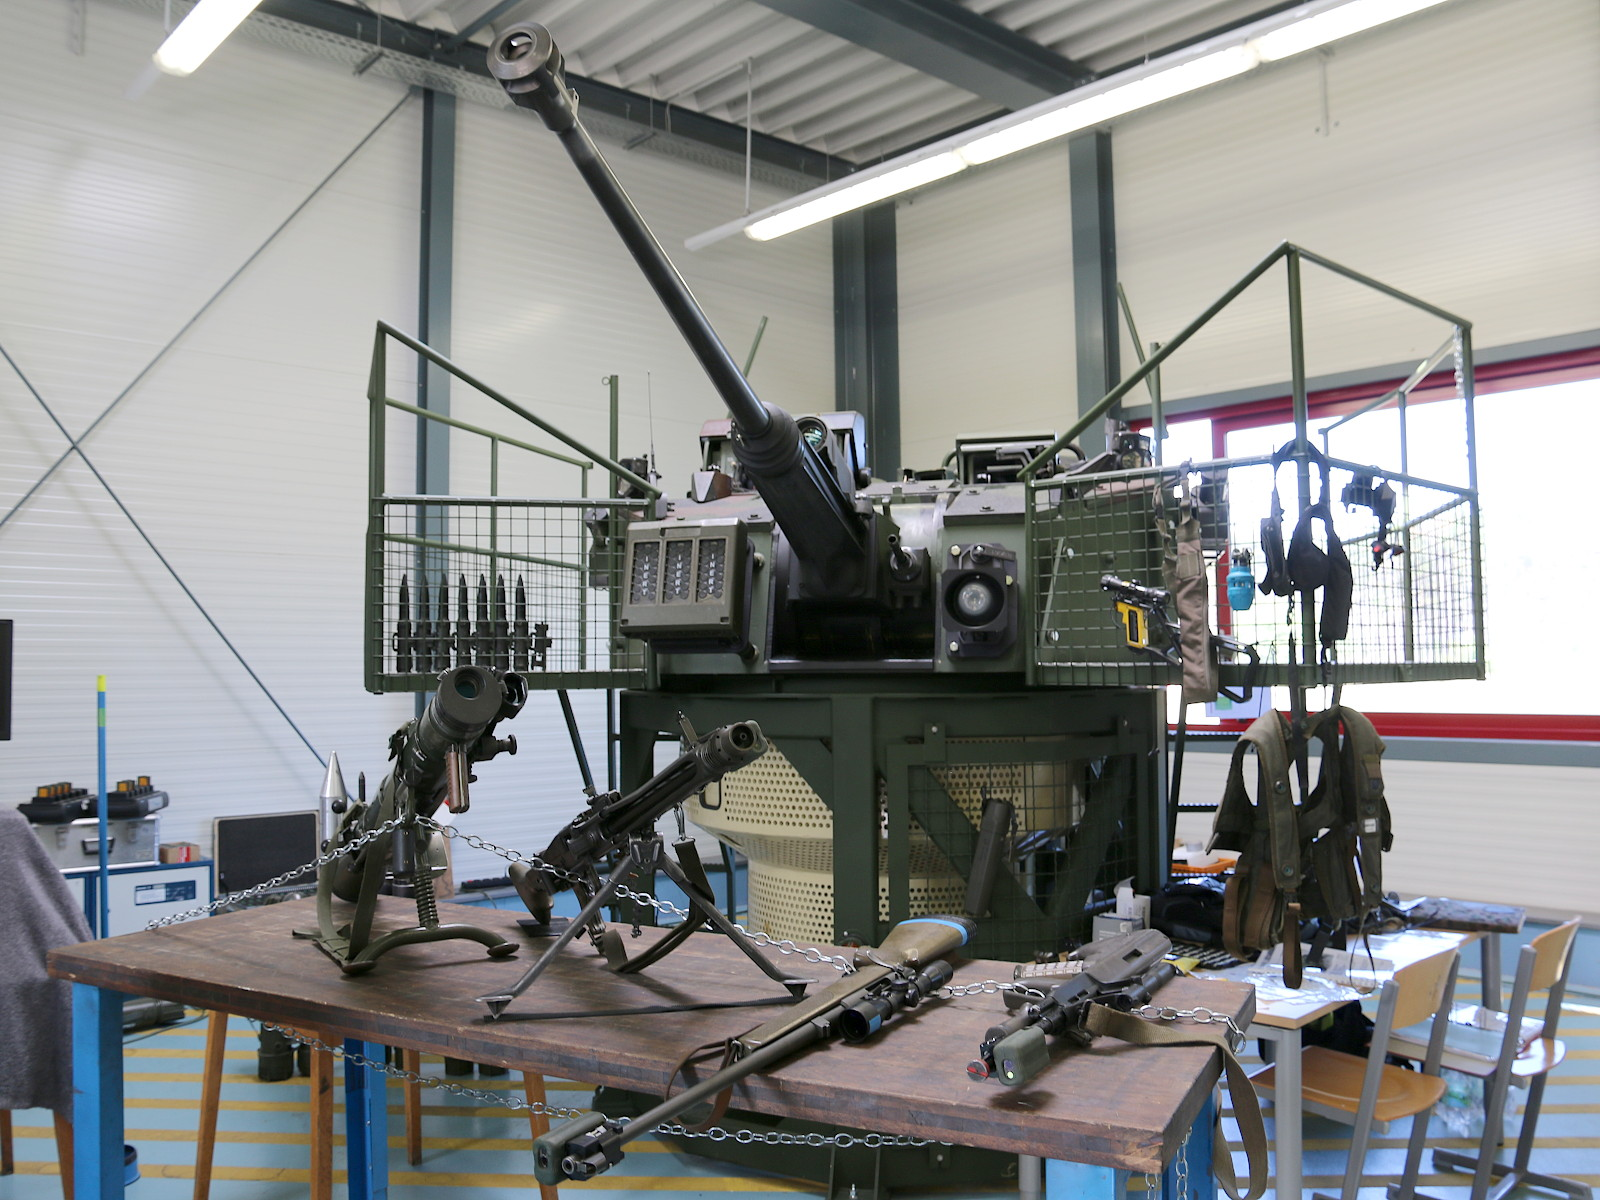 Steyr SP-30 Turmsimulator mit Duellsimulatoren. Davor Infanteriewaffen mit Duellsimulatoren © Doppeladler.com